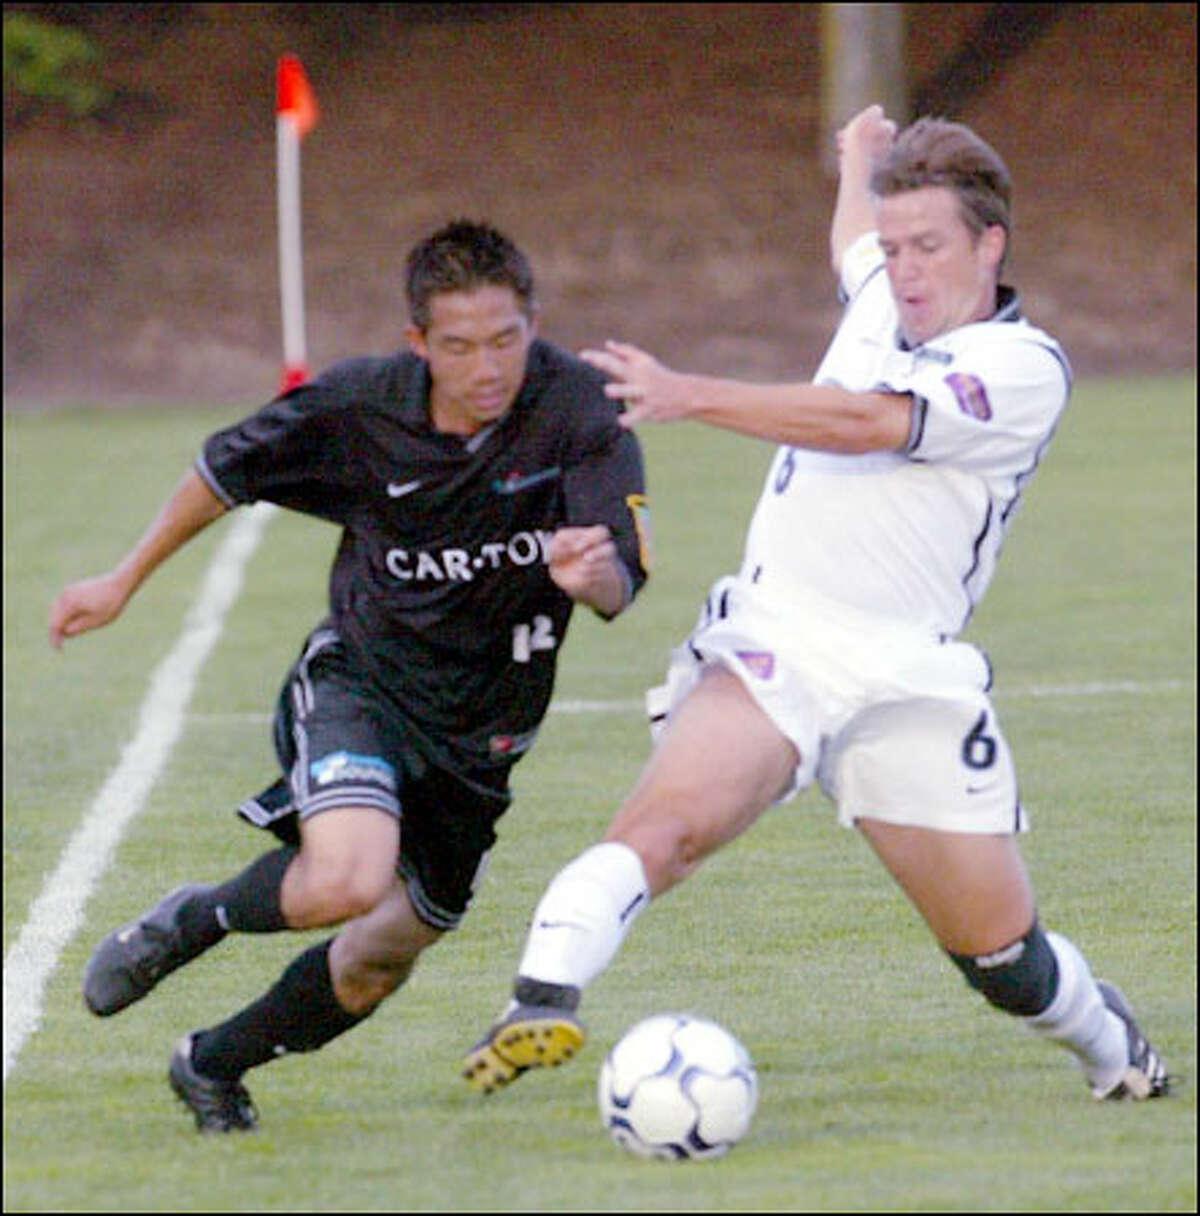 Seattle midfielder Viet Nguyen, left, and San Jose counterpart Ronnie Ekelund battle for the ball.